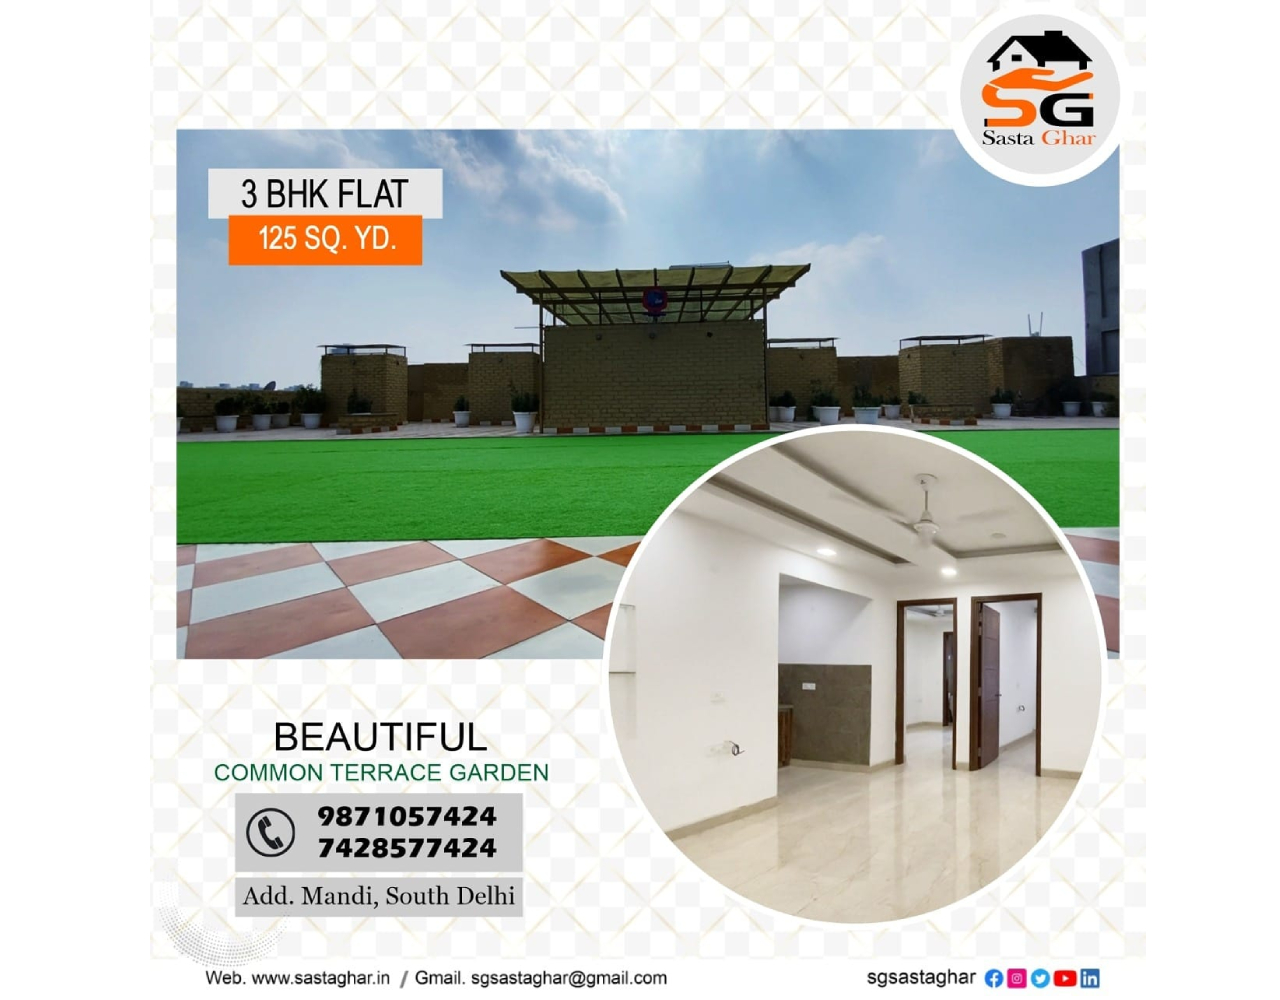 3 BHK flats In Mandi South Delhi